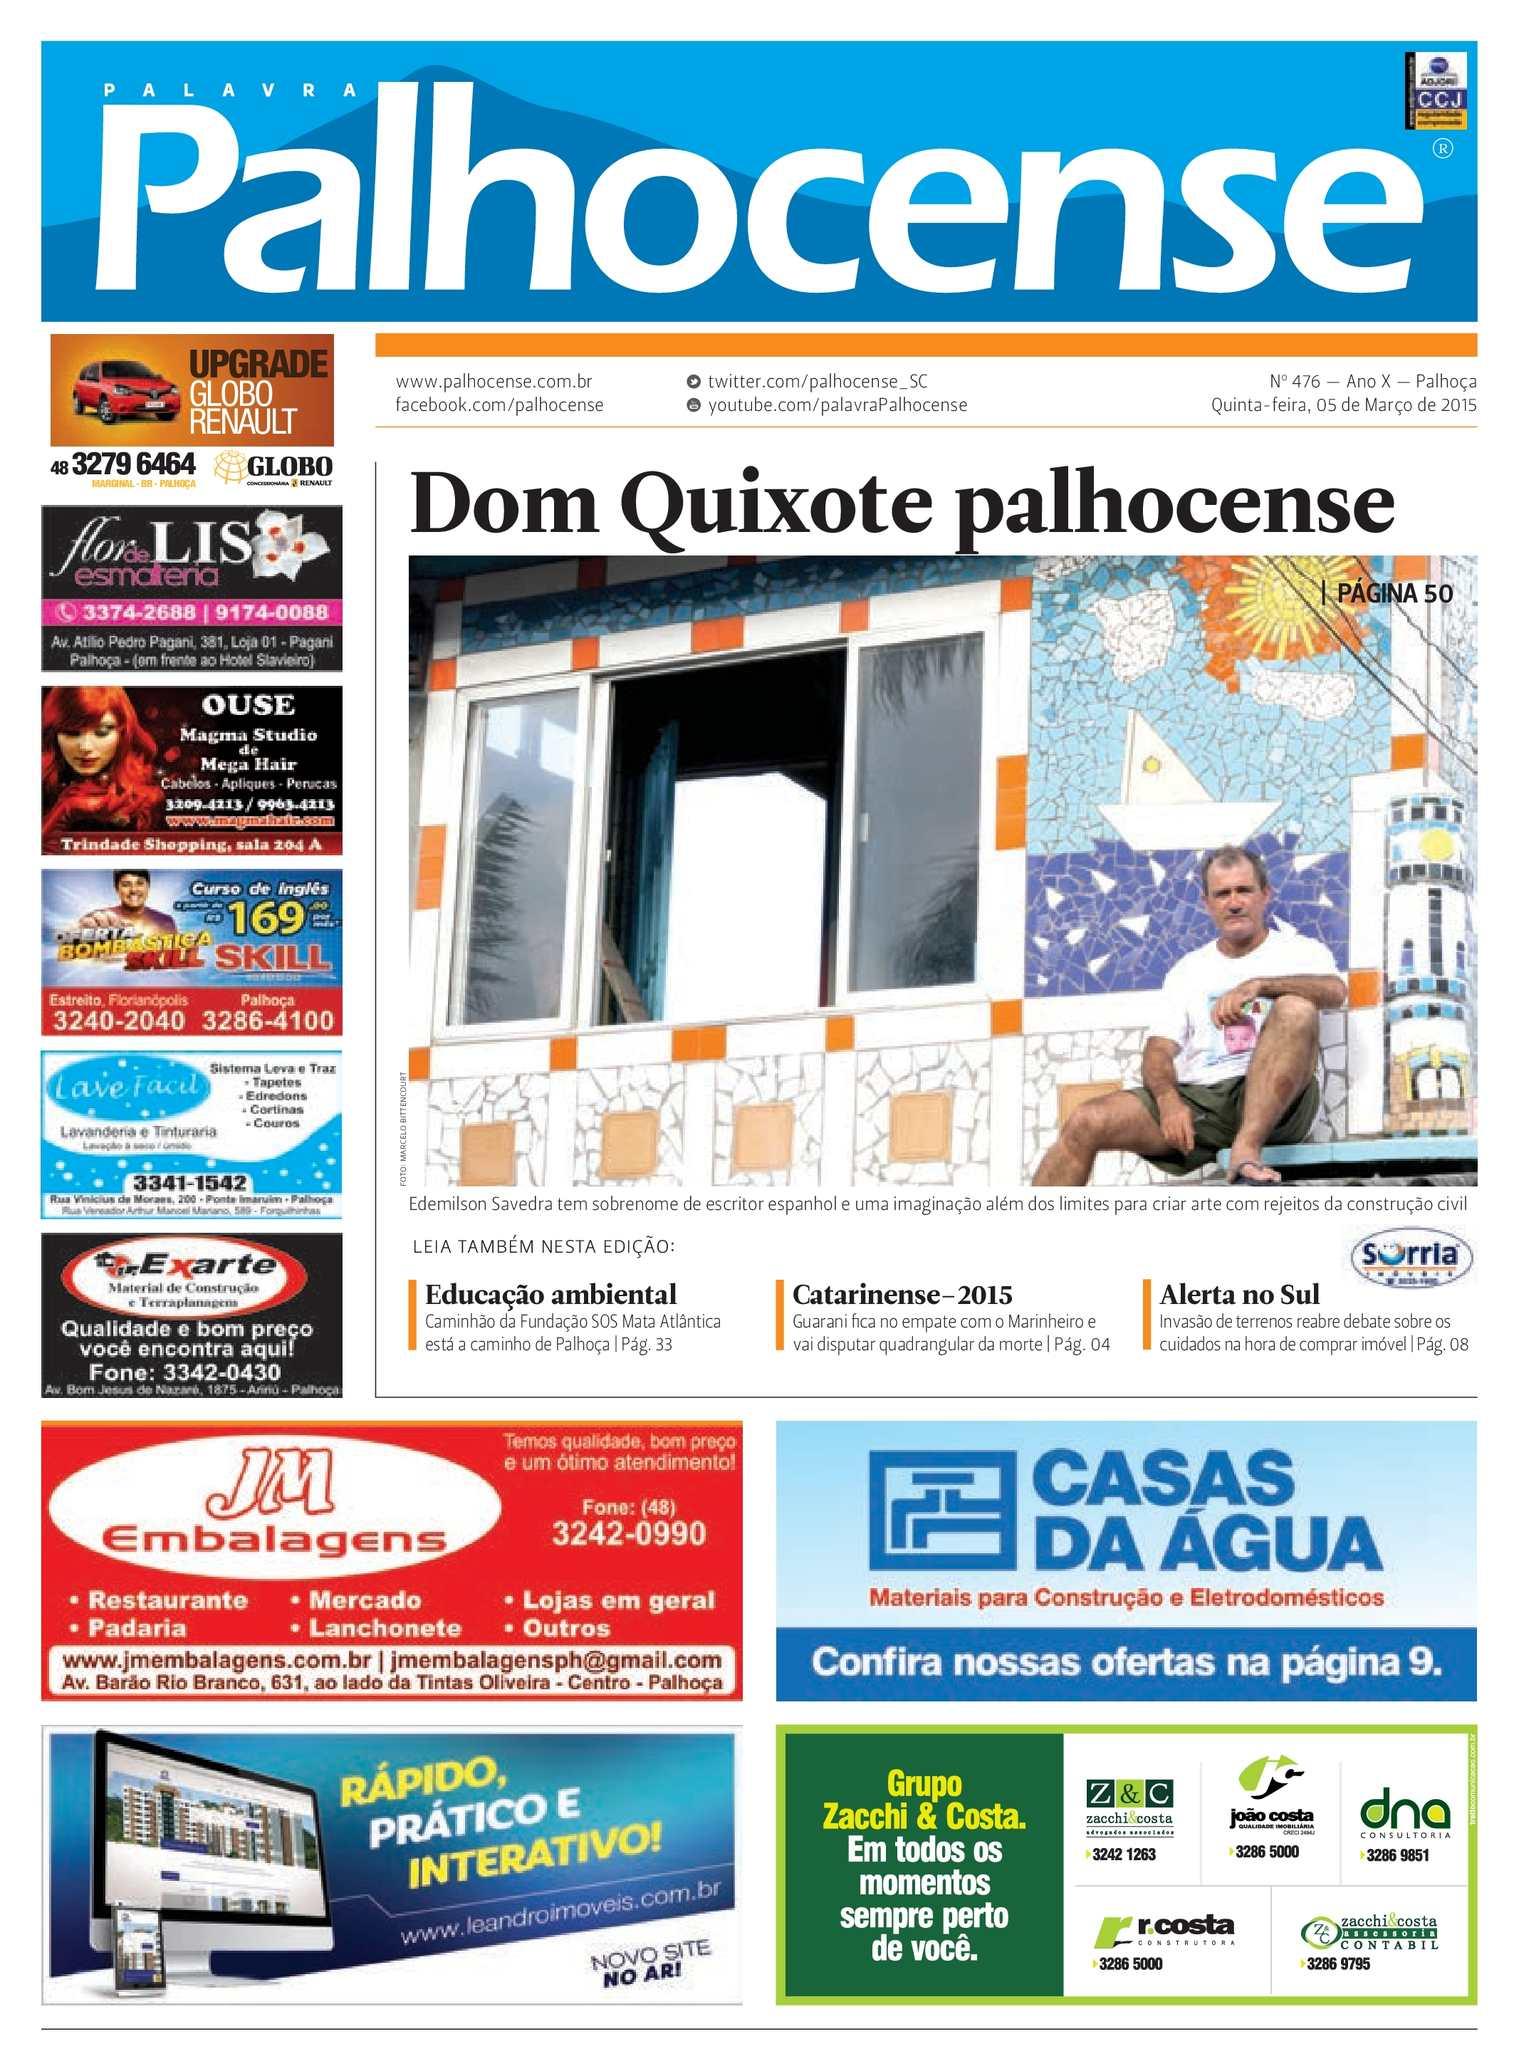 89b49ab5ca4 Calaméo - Jornal Palavra Palhocense - Edição 476